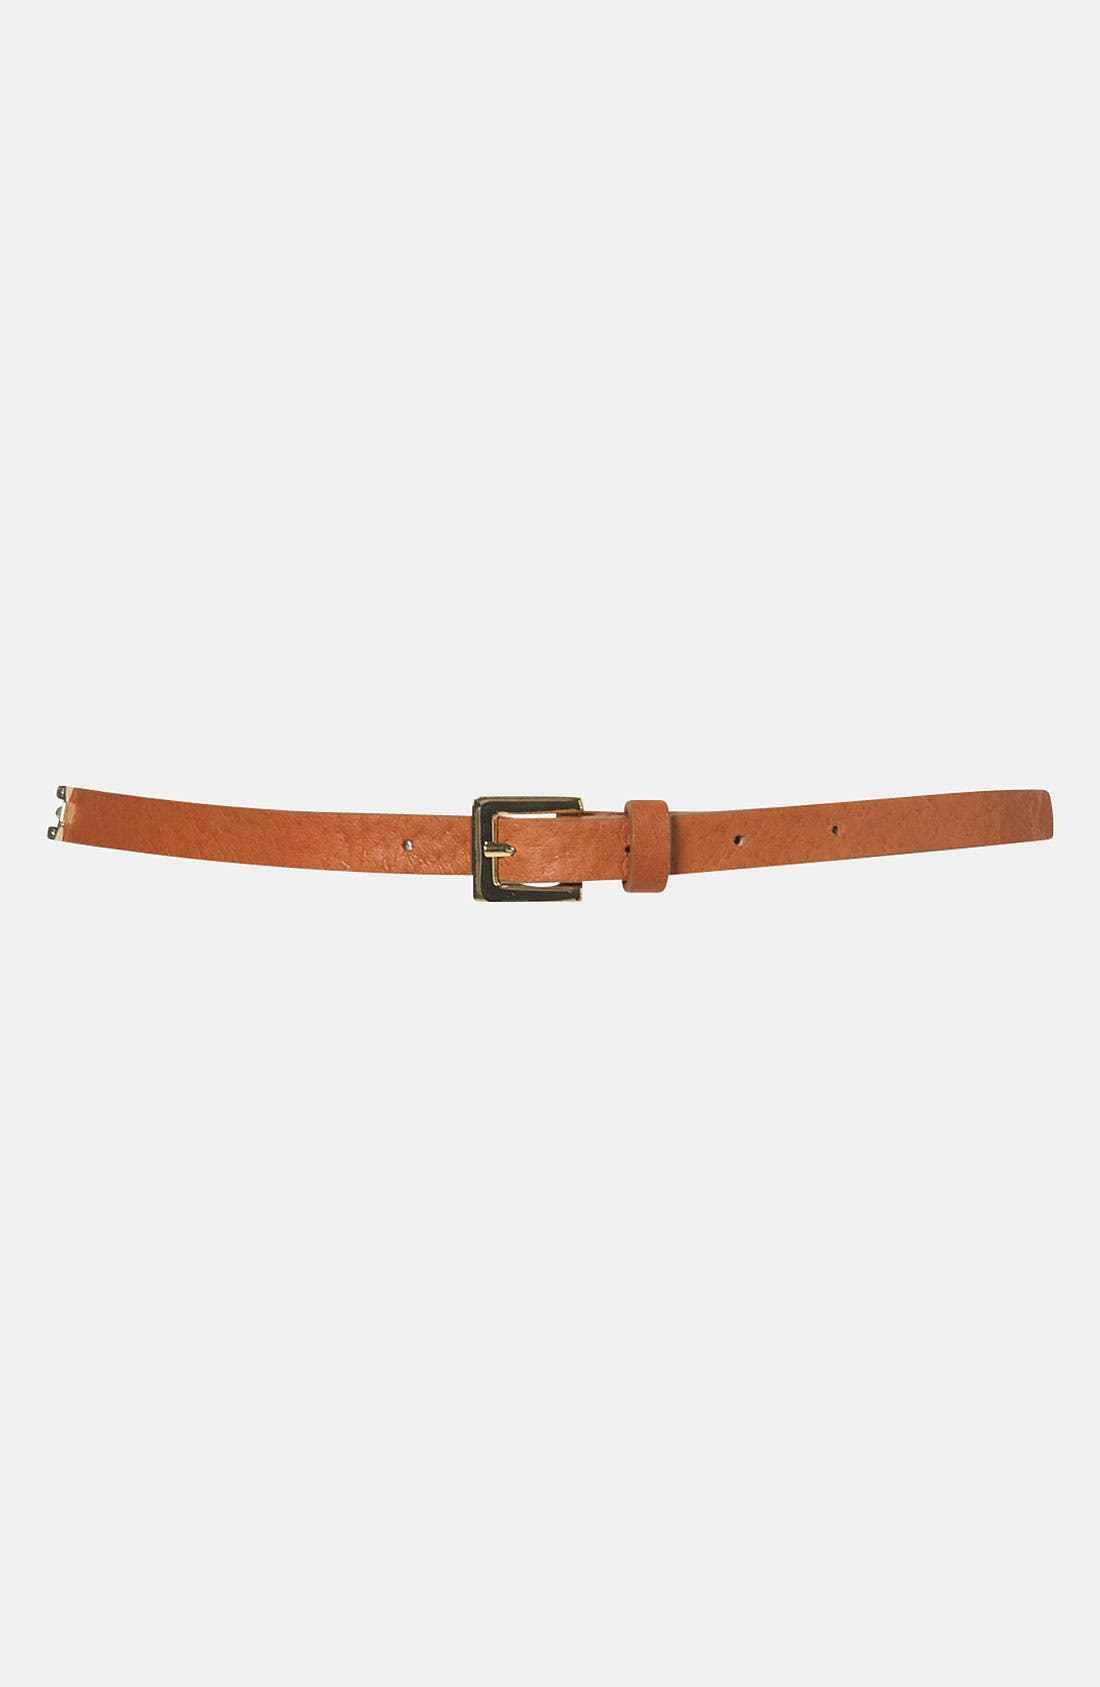 Alternate Image 1 Selected - Topshop 'Snaffle' Skinny Belt